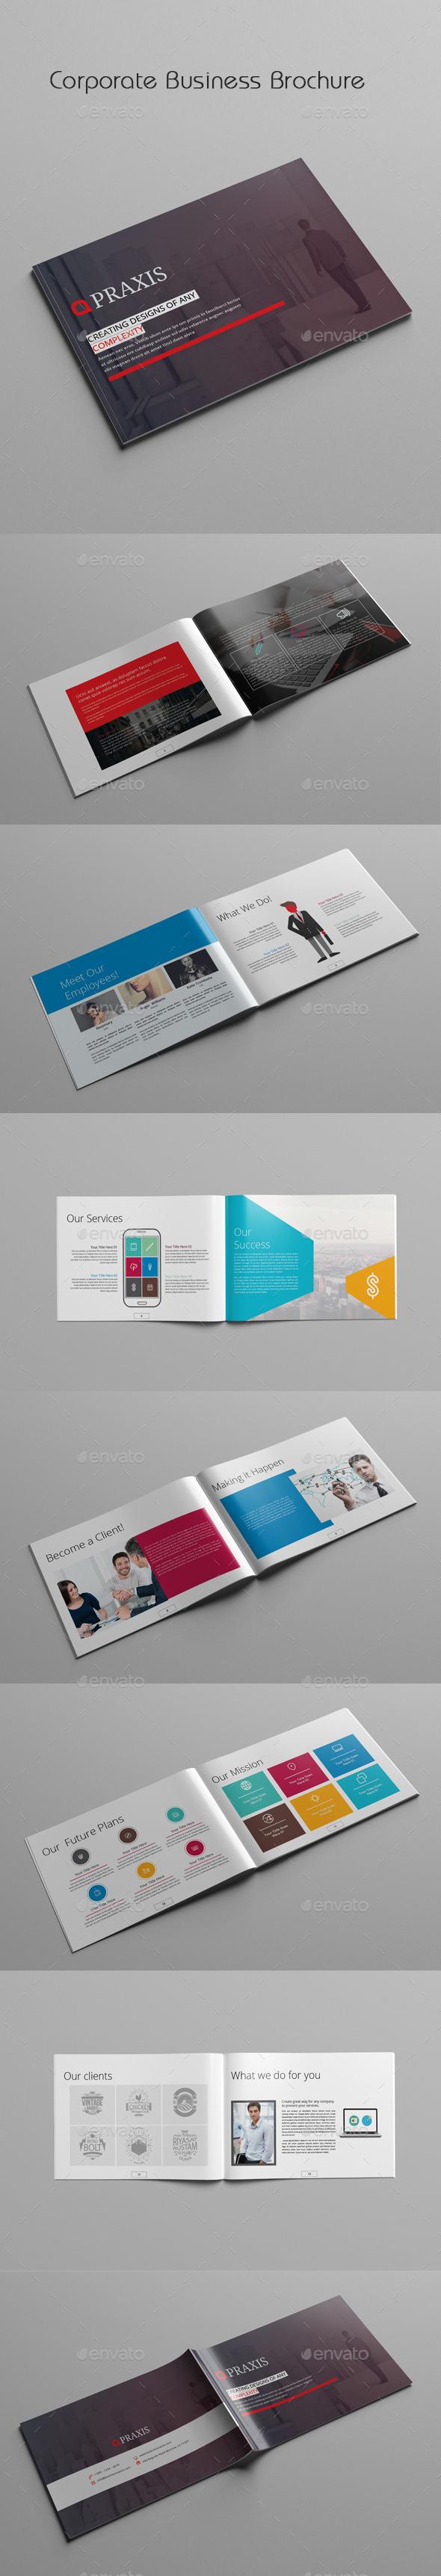 GraphicRiver Corporate Business Brochure 11861464